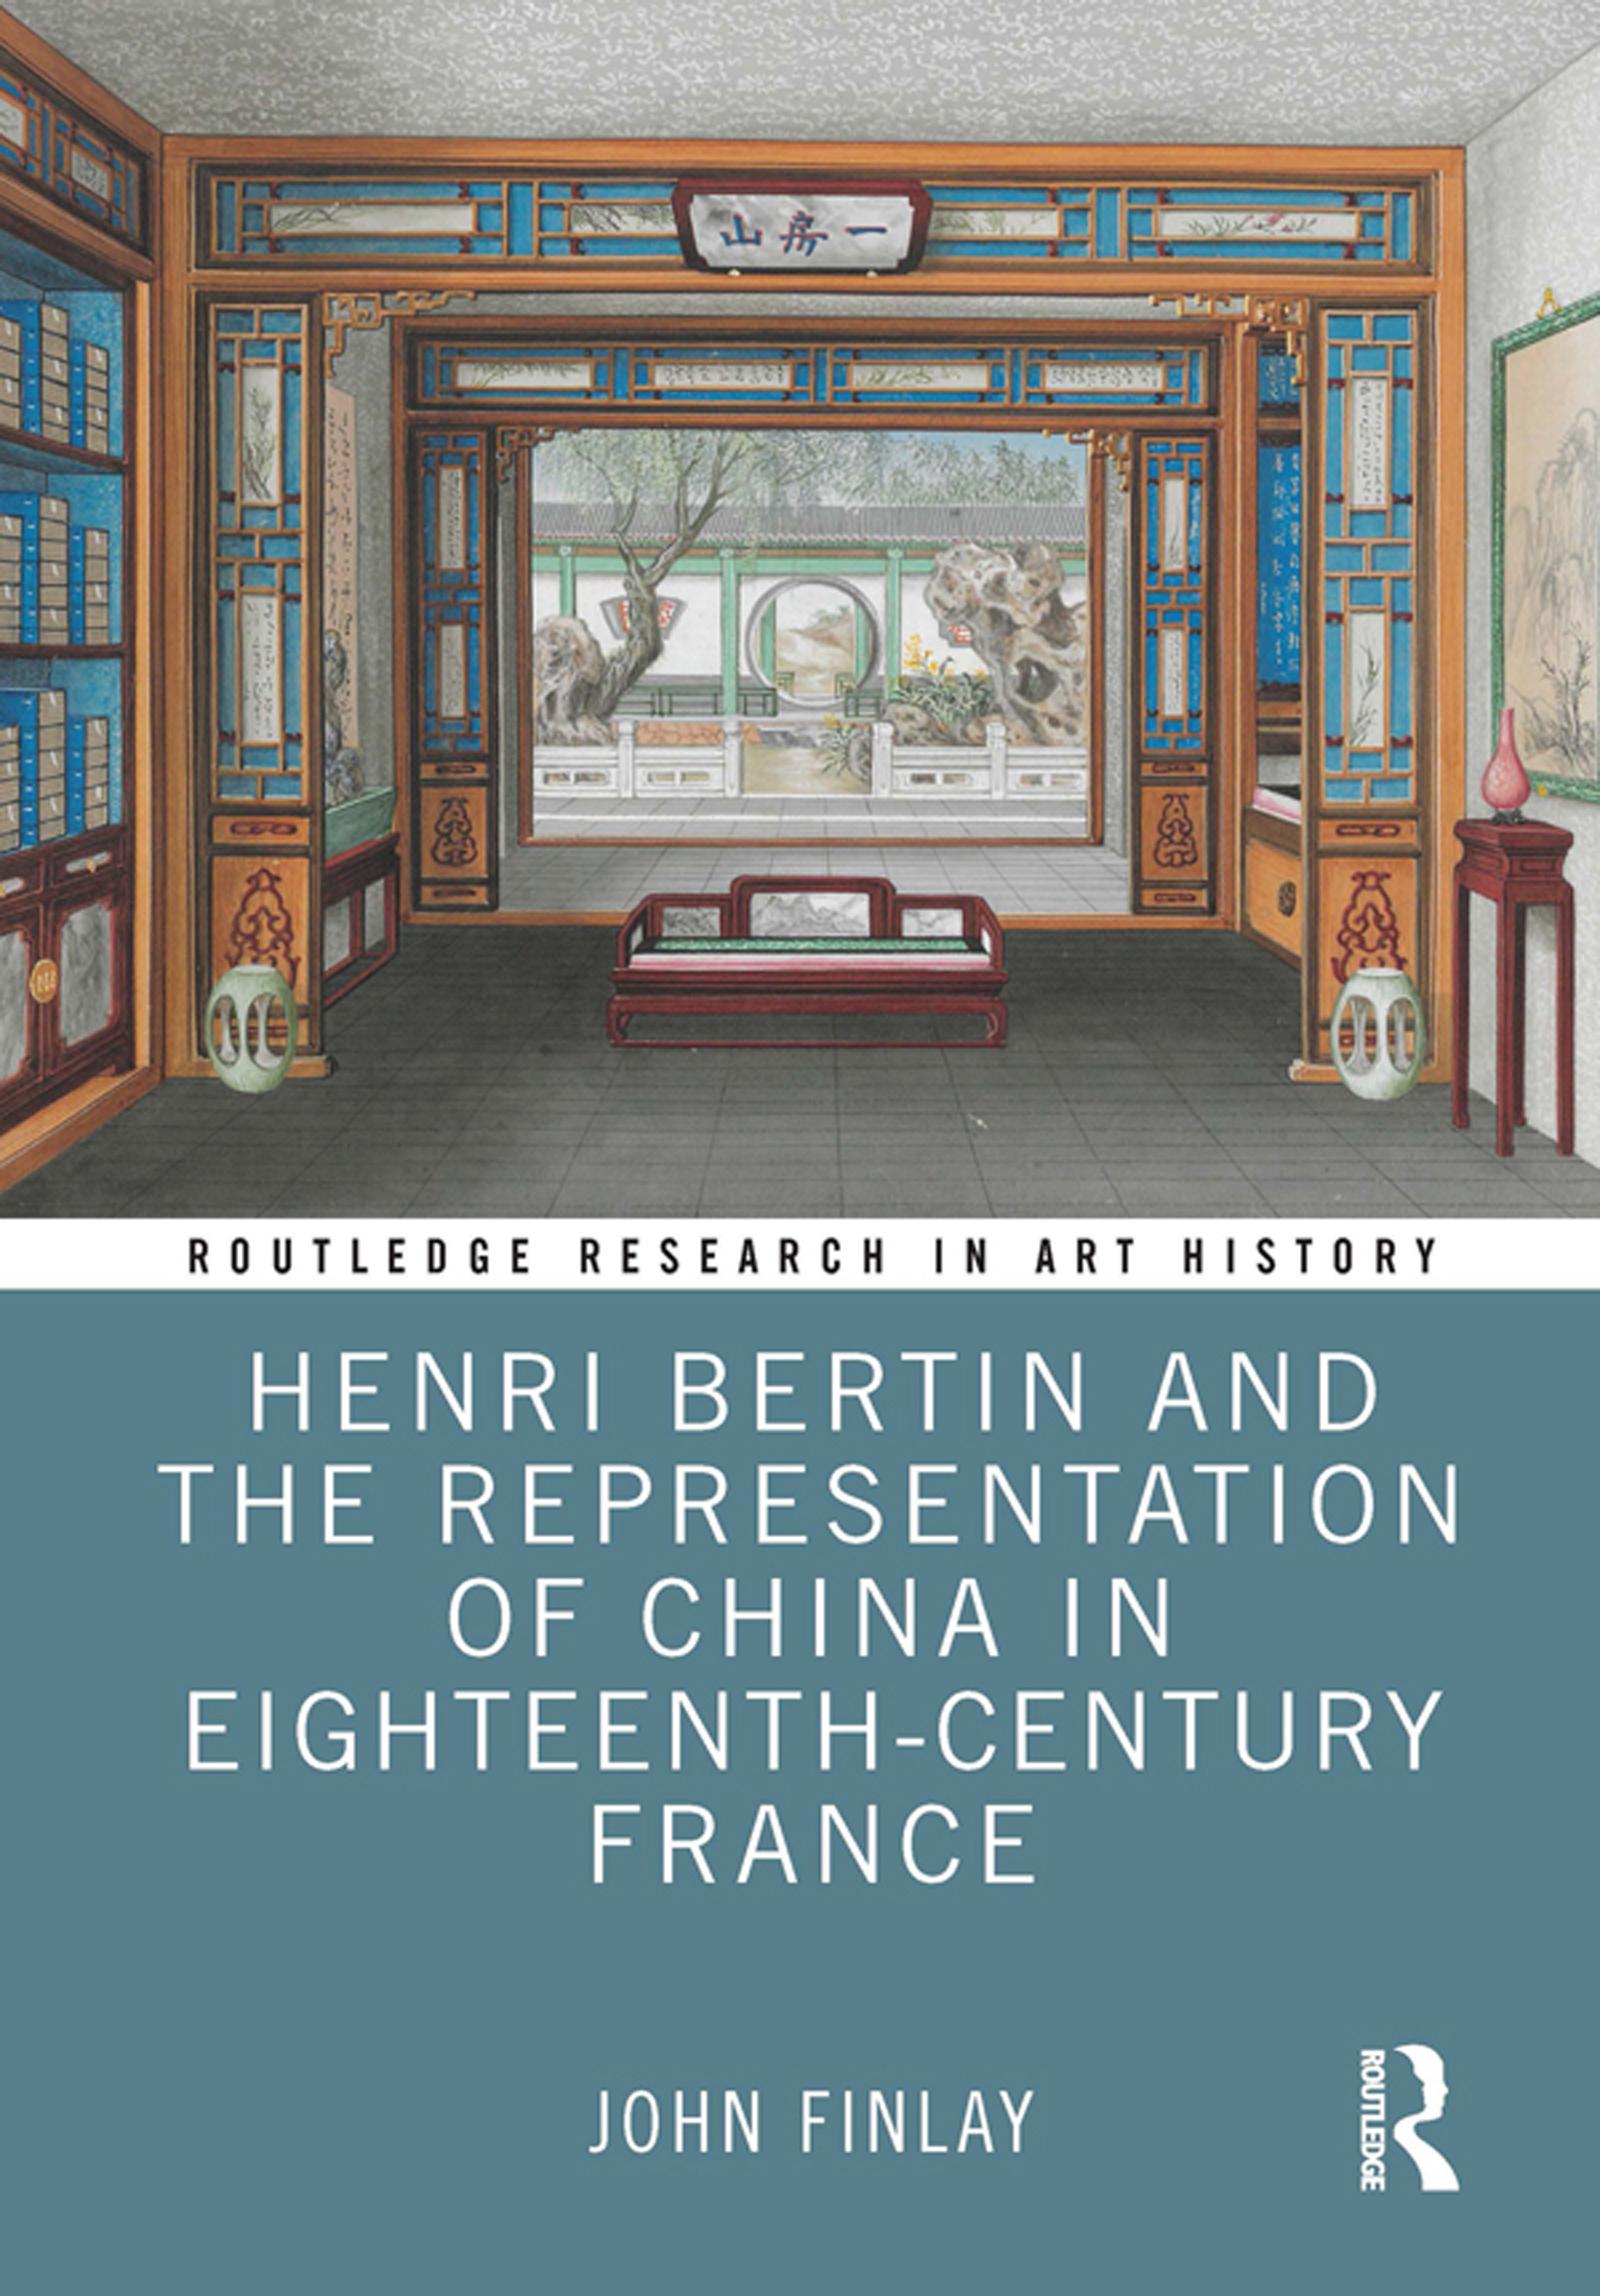 Henri Bertin and the Representation of China in Eighteenth-Century France